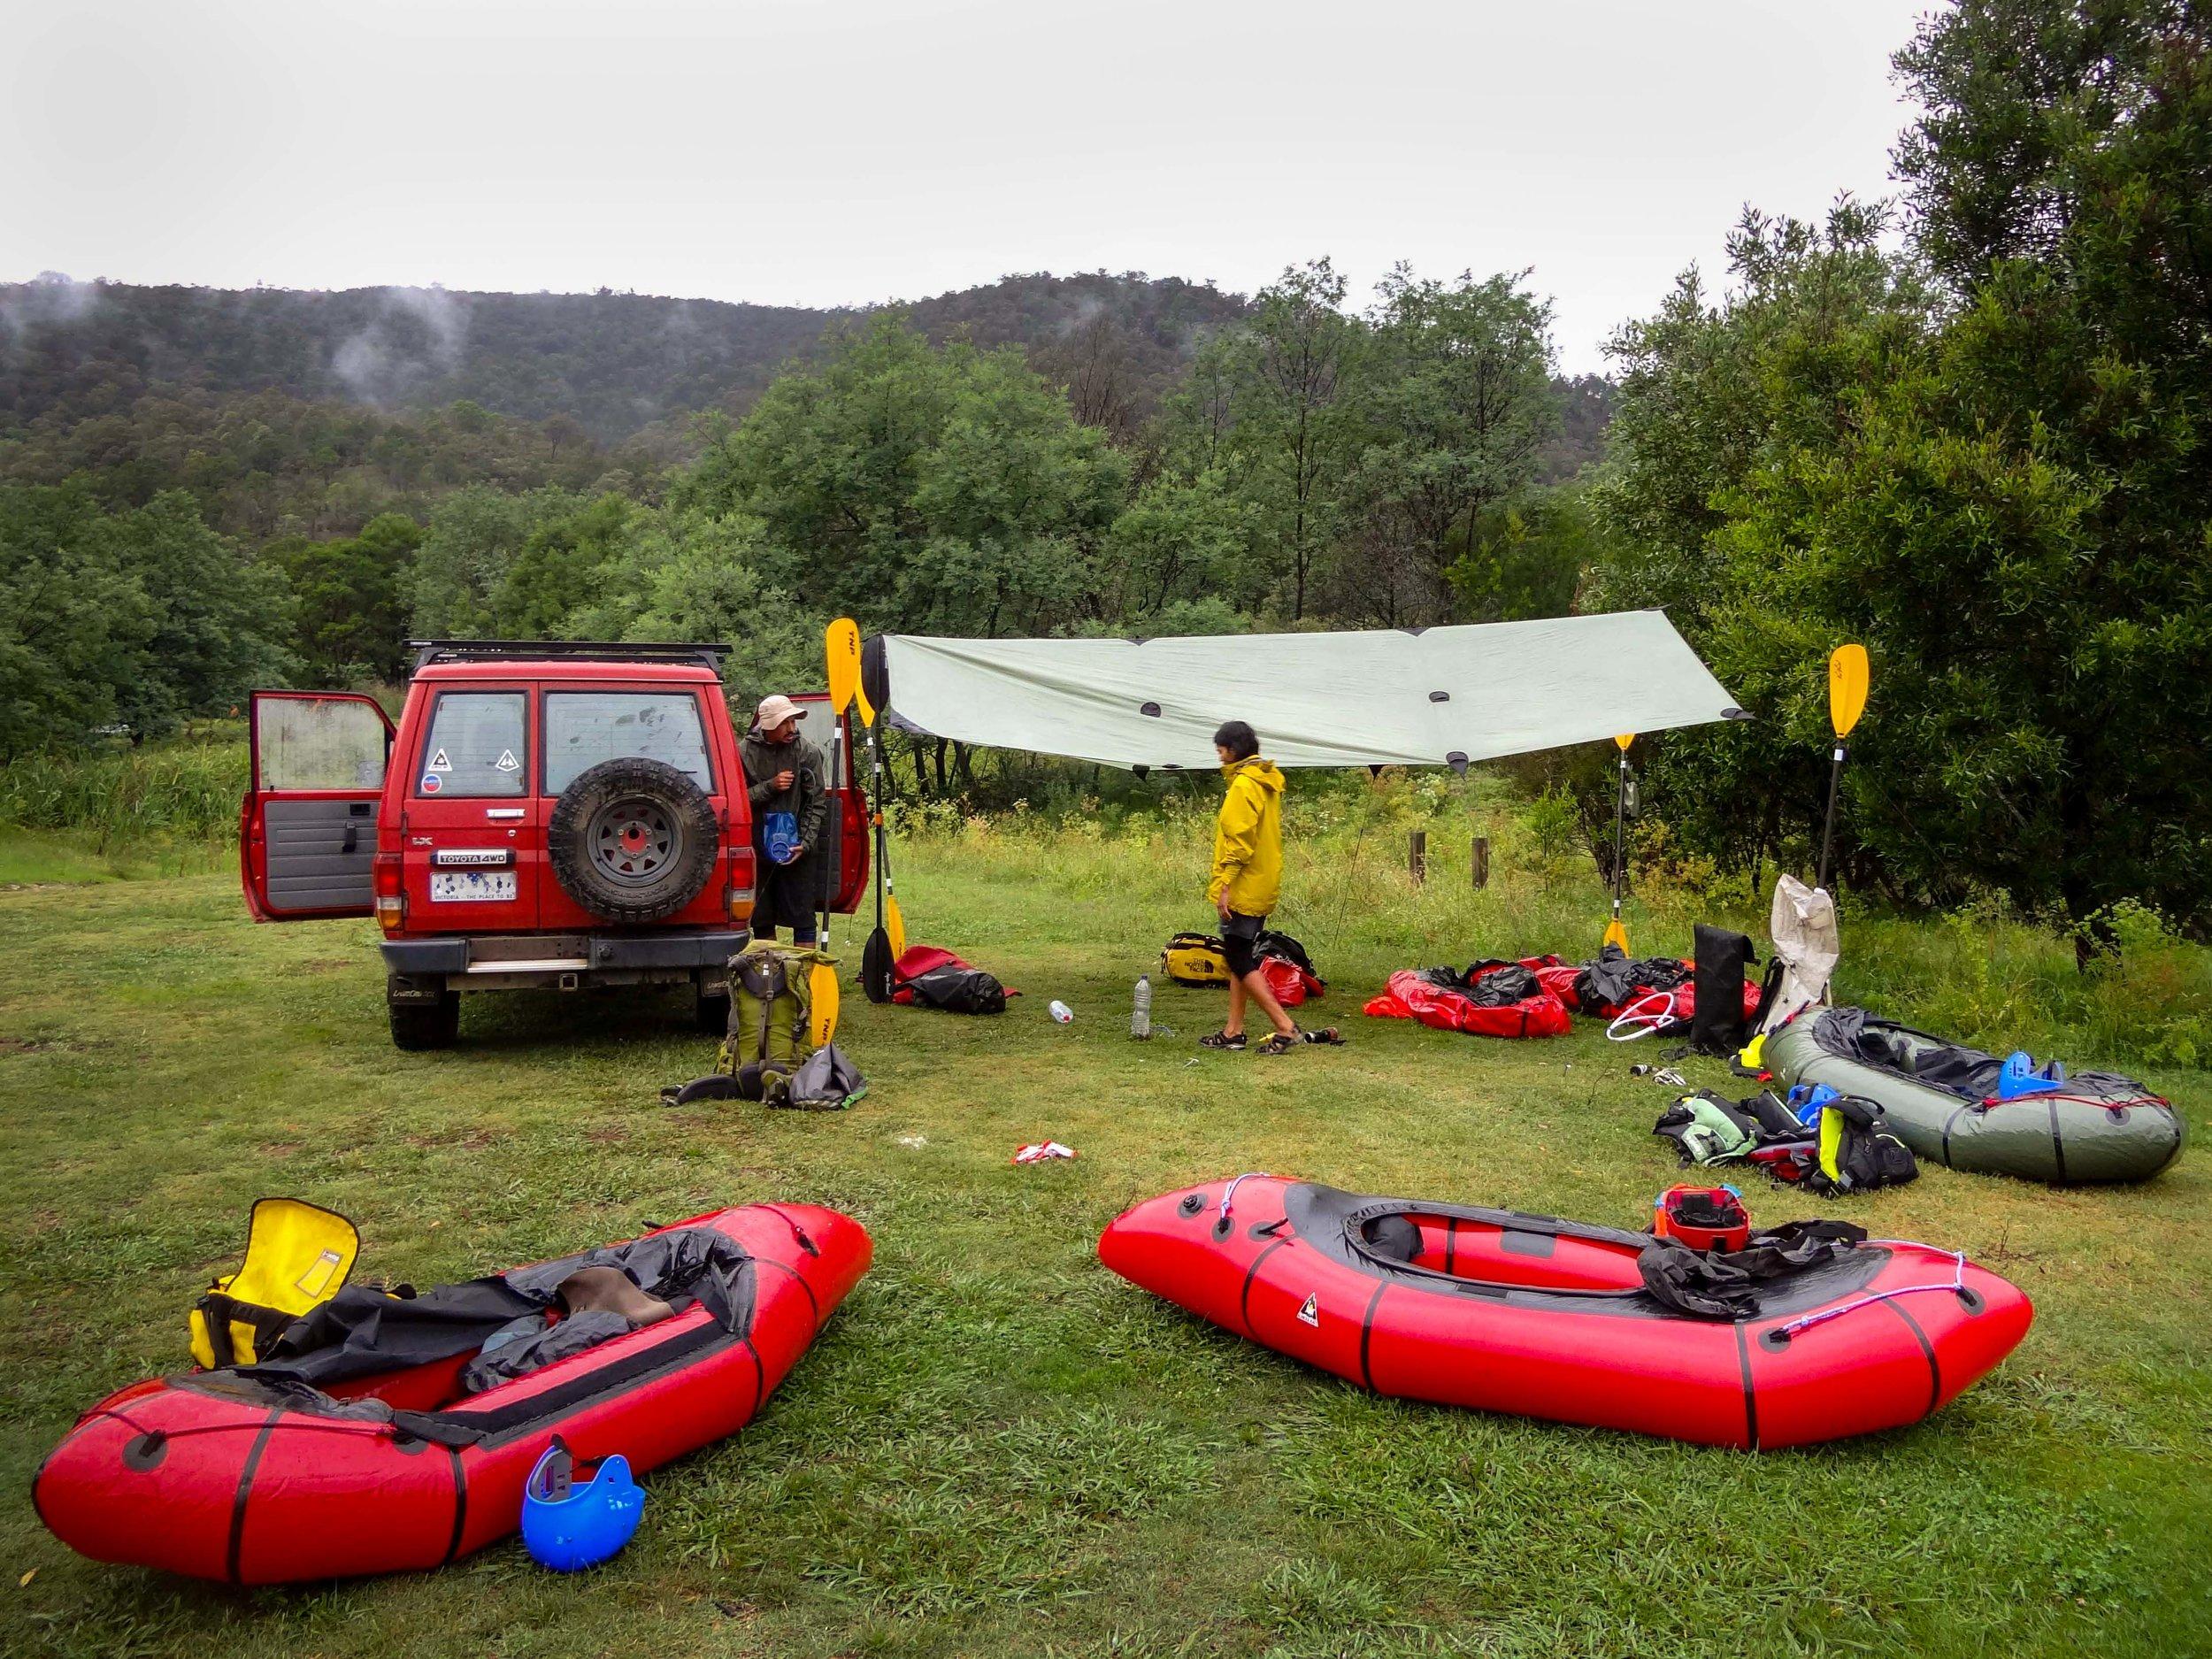 Pack_Raft_Australia_Gearing_Up_Mitchell_River_Alpacka_Raft.jpg